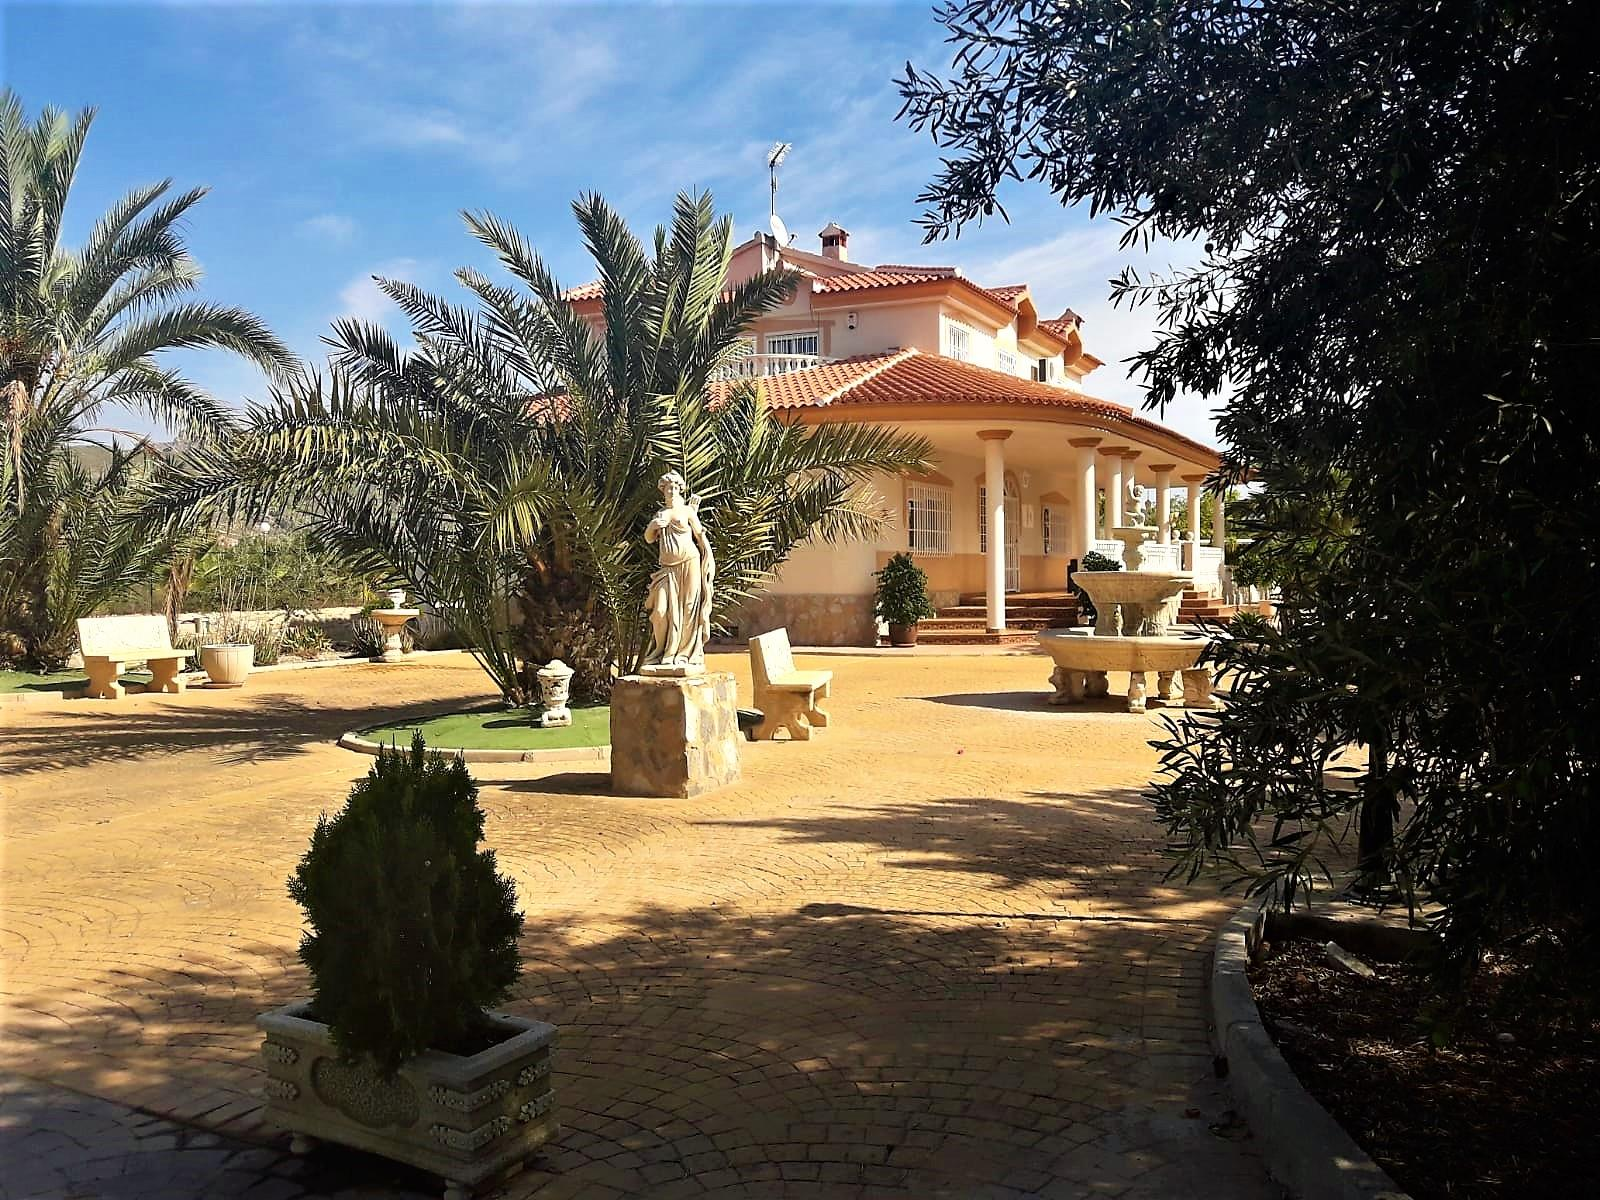 Maison - Murcia - #4134055-0